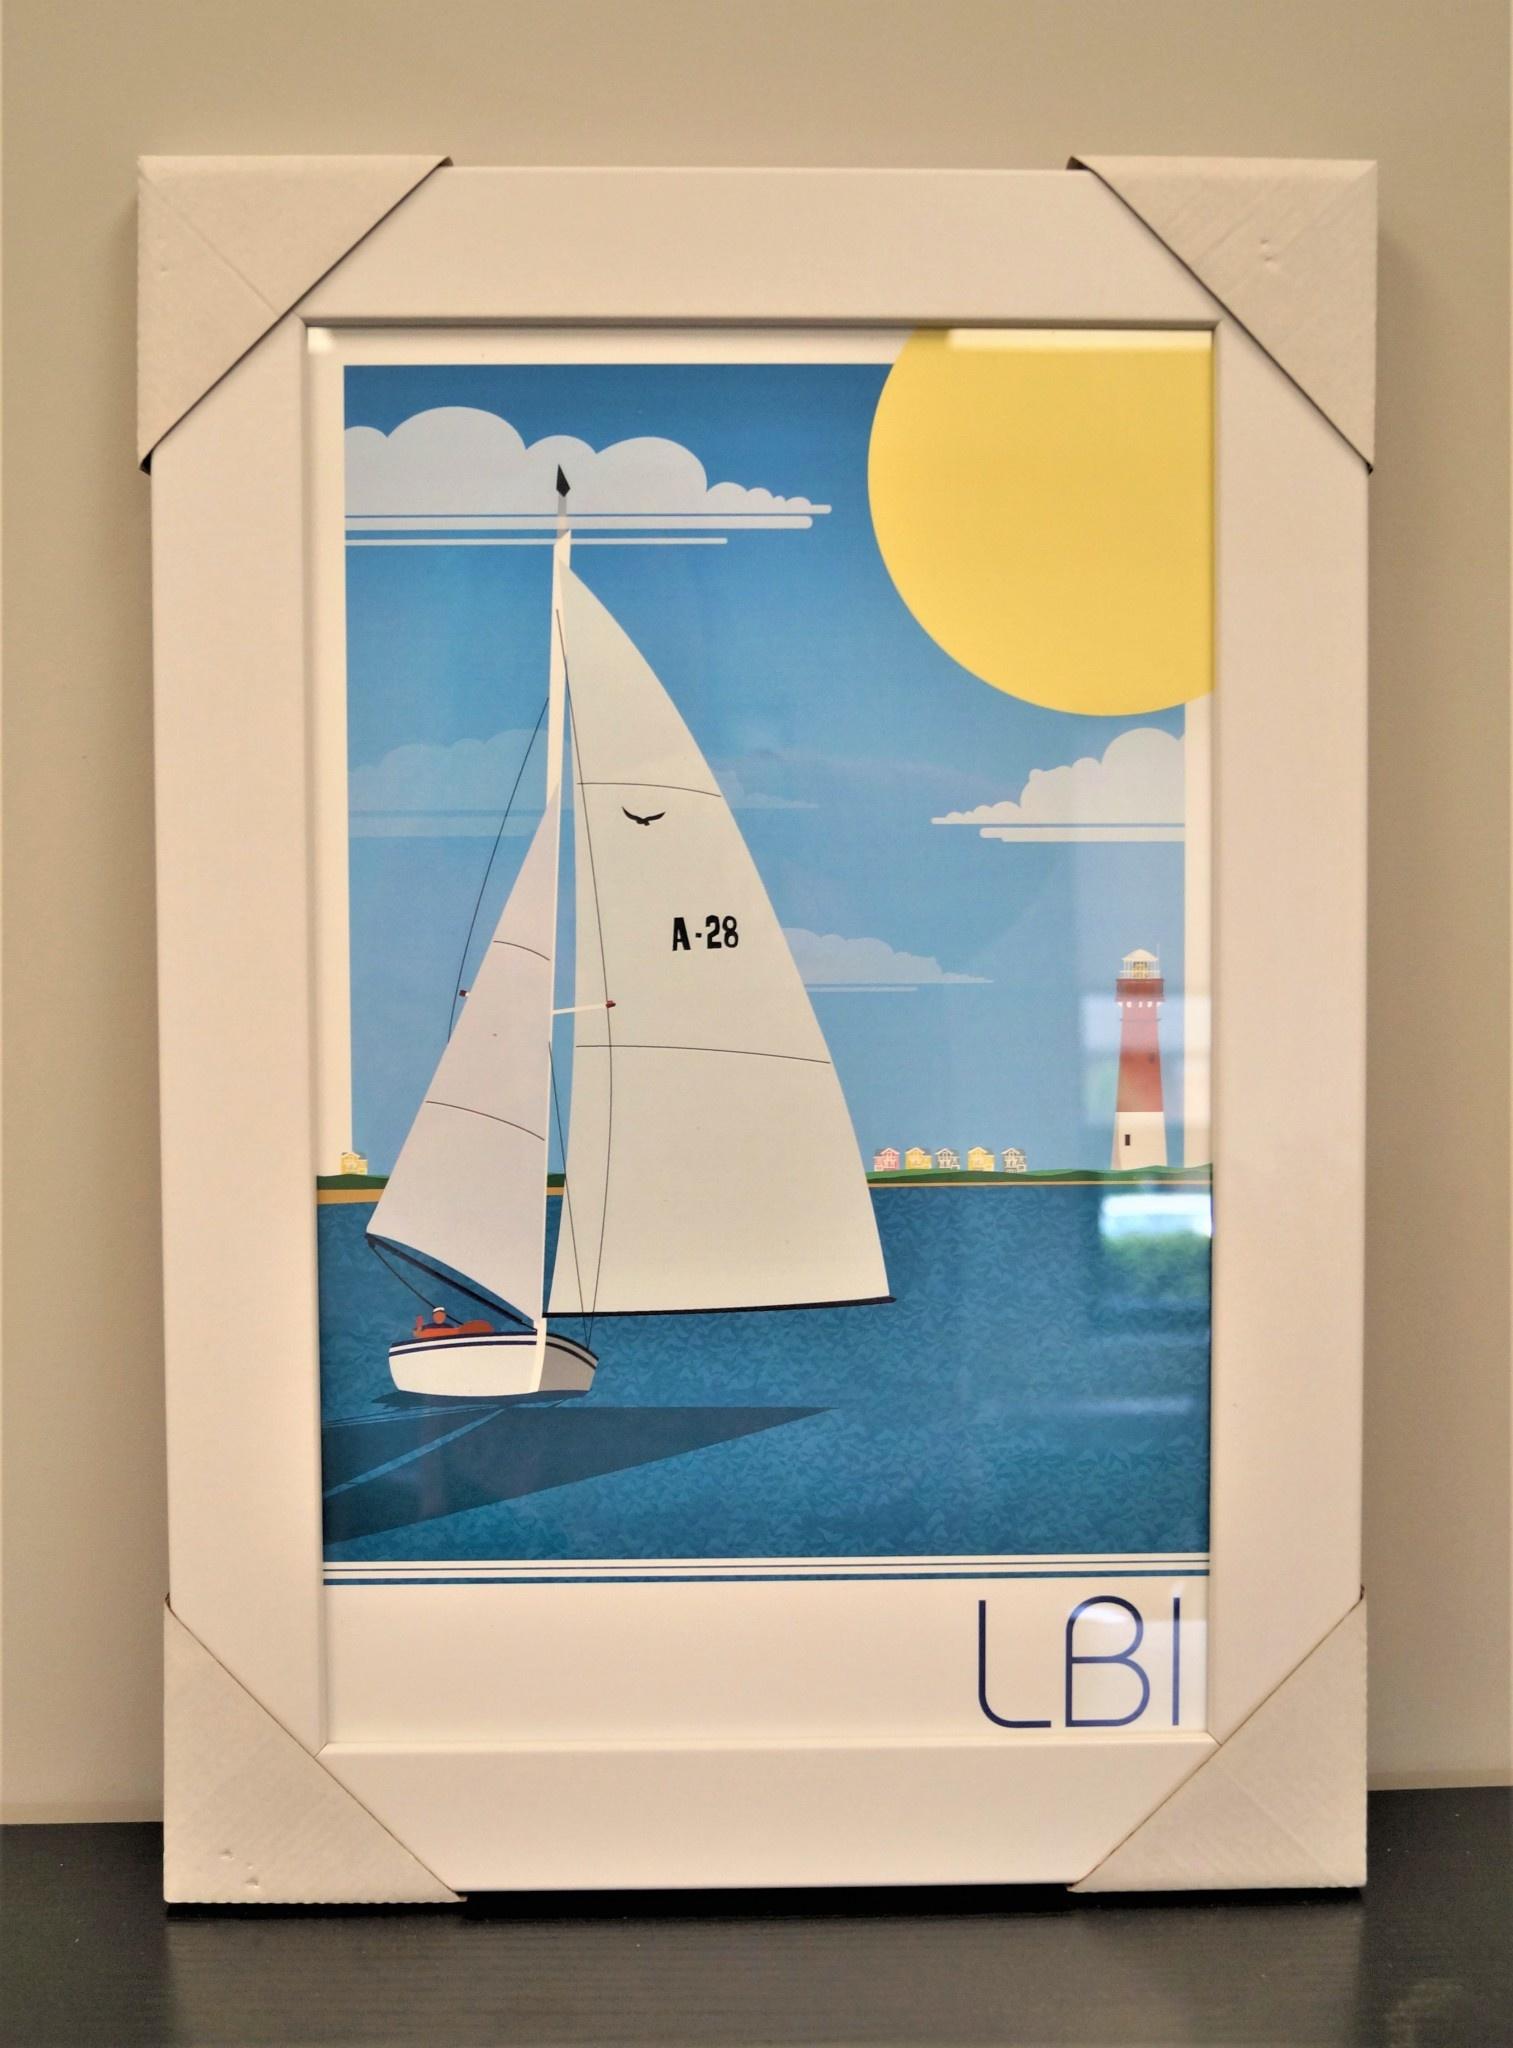 LBI Sailboat 11x17 White Frame